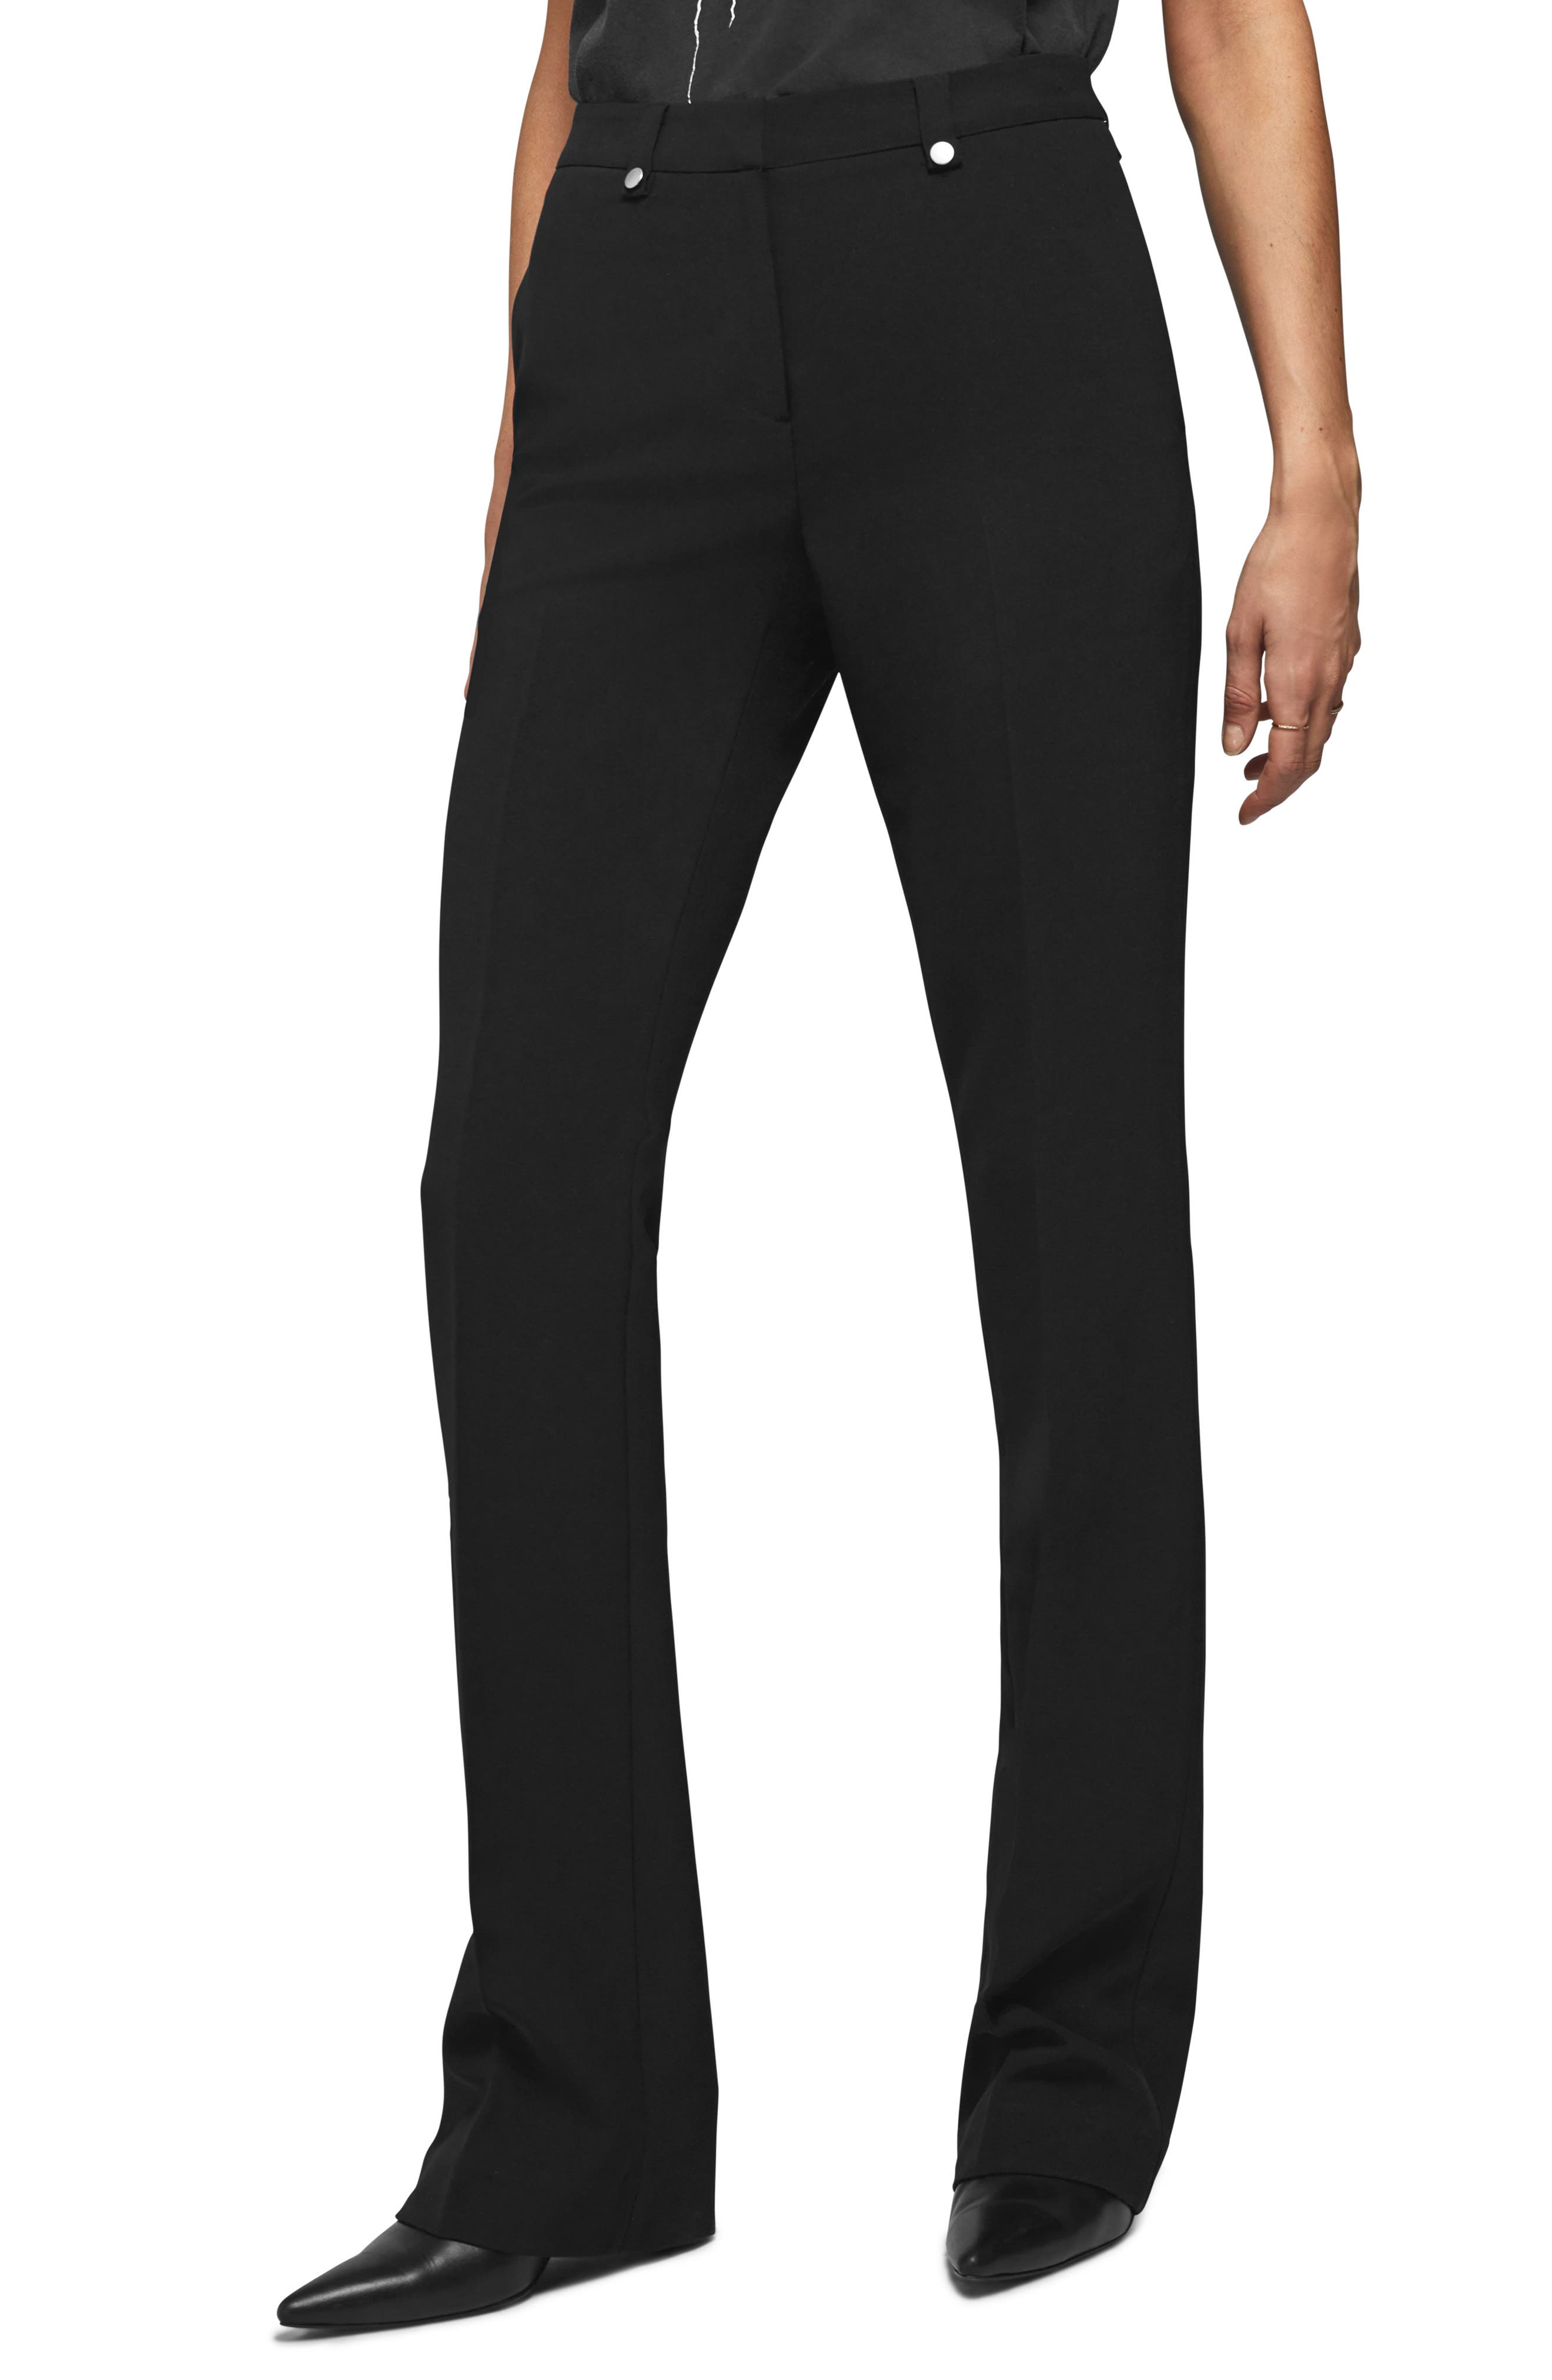 Anine Bing Flared Suit Pants, Black